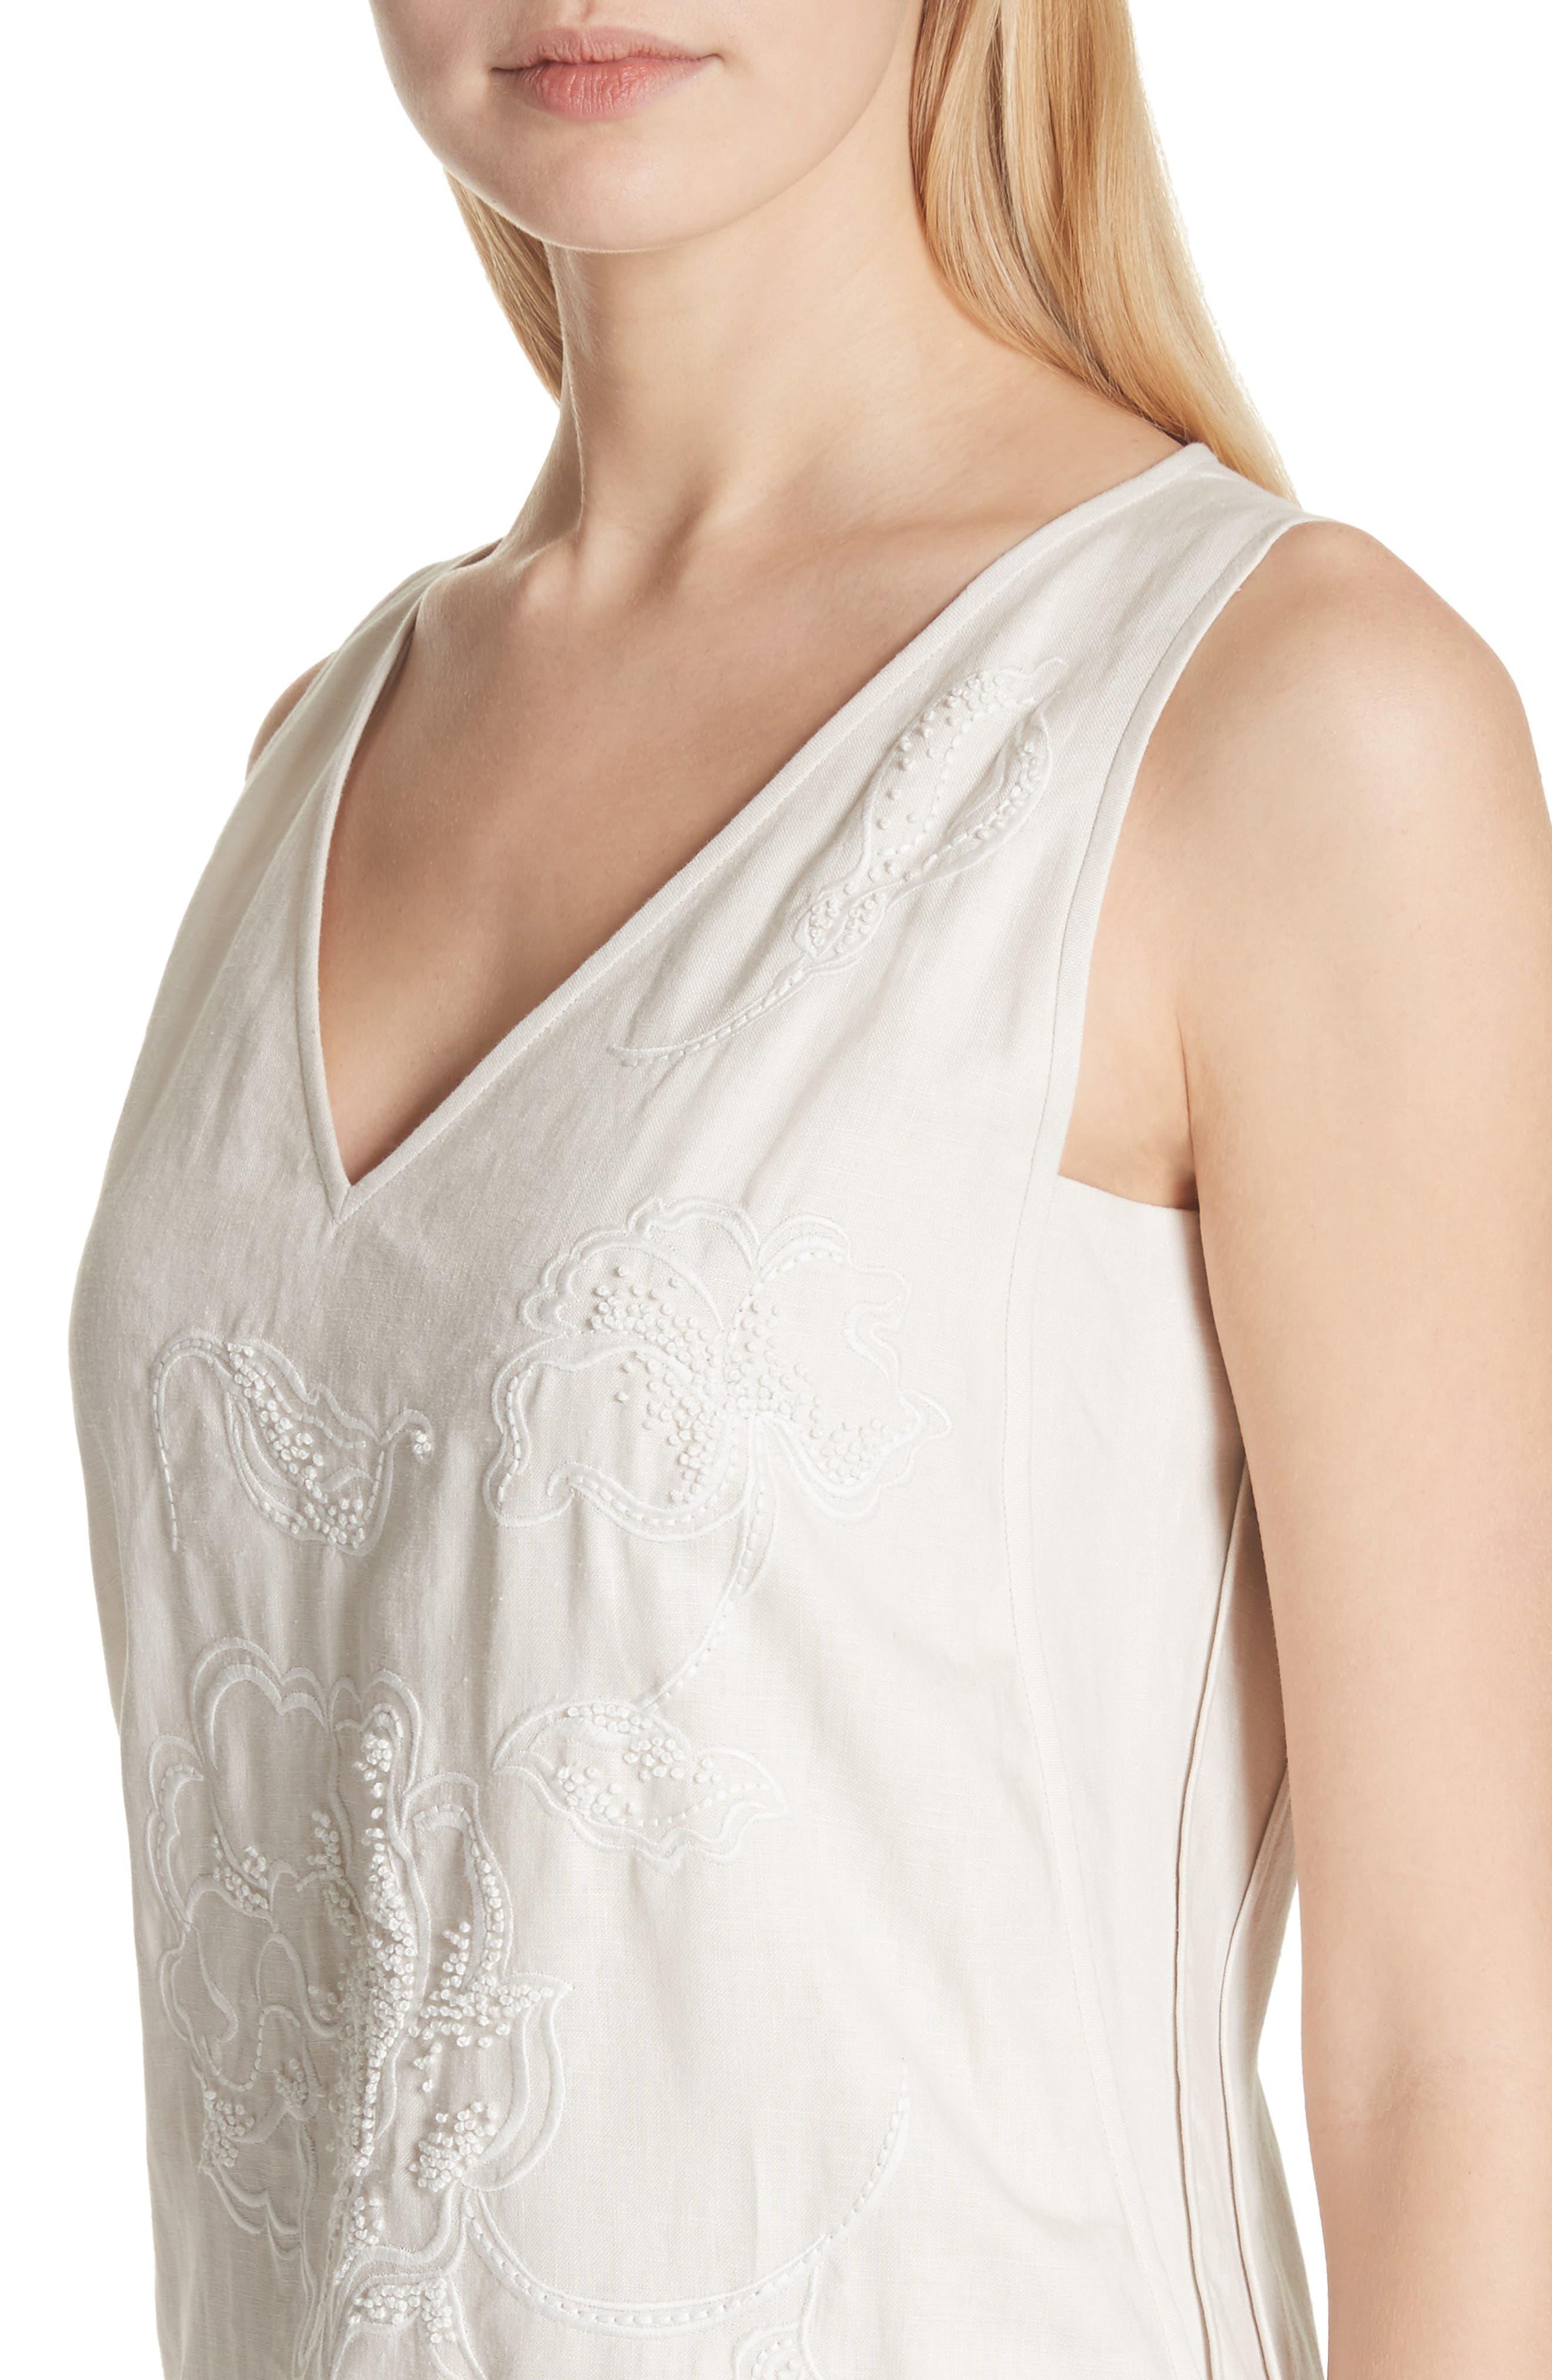 Duncan Embroidered Linen Dress,                             Alternate thumbnail 4, color,                             252